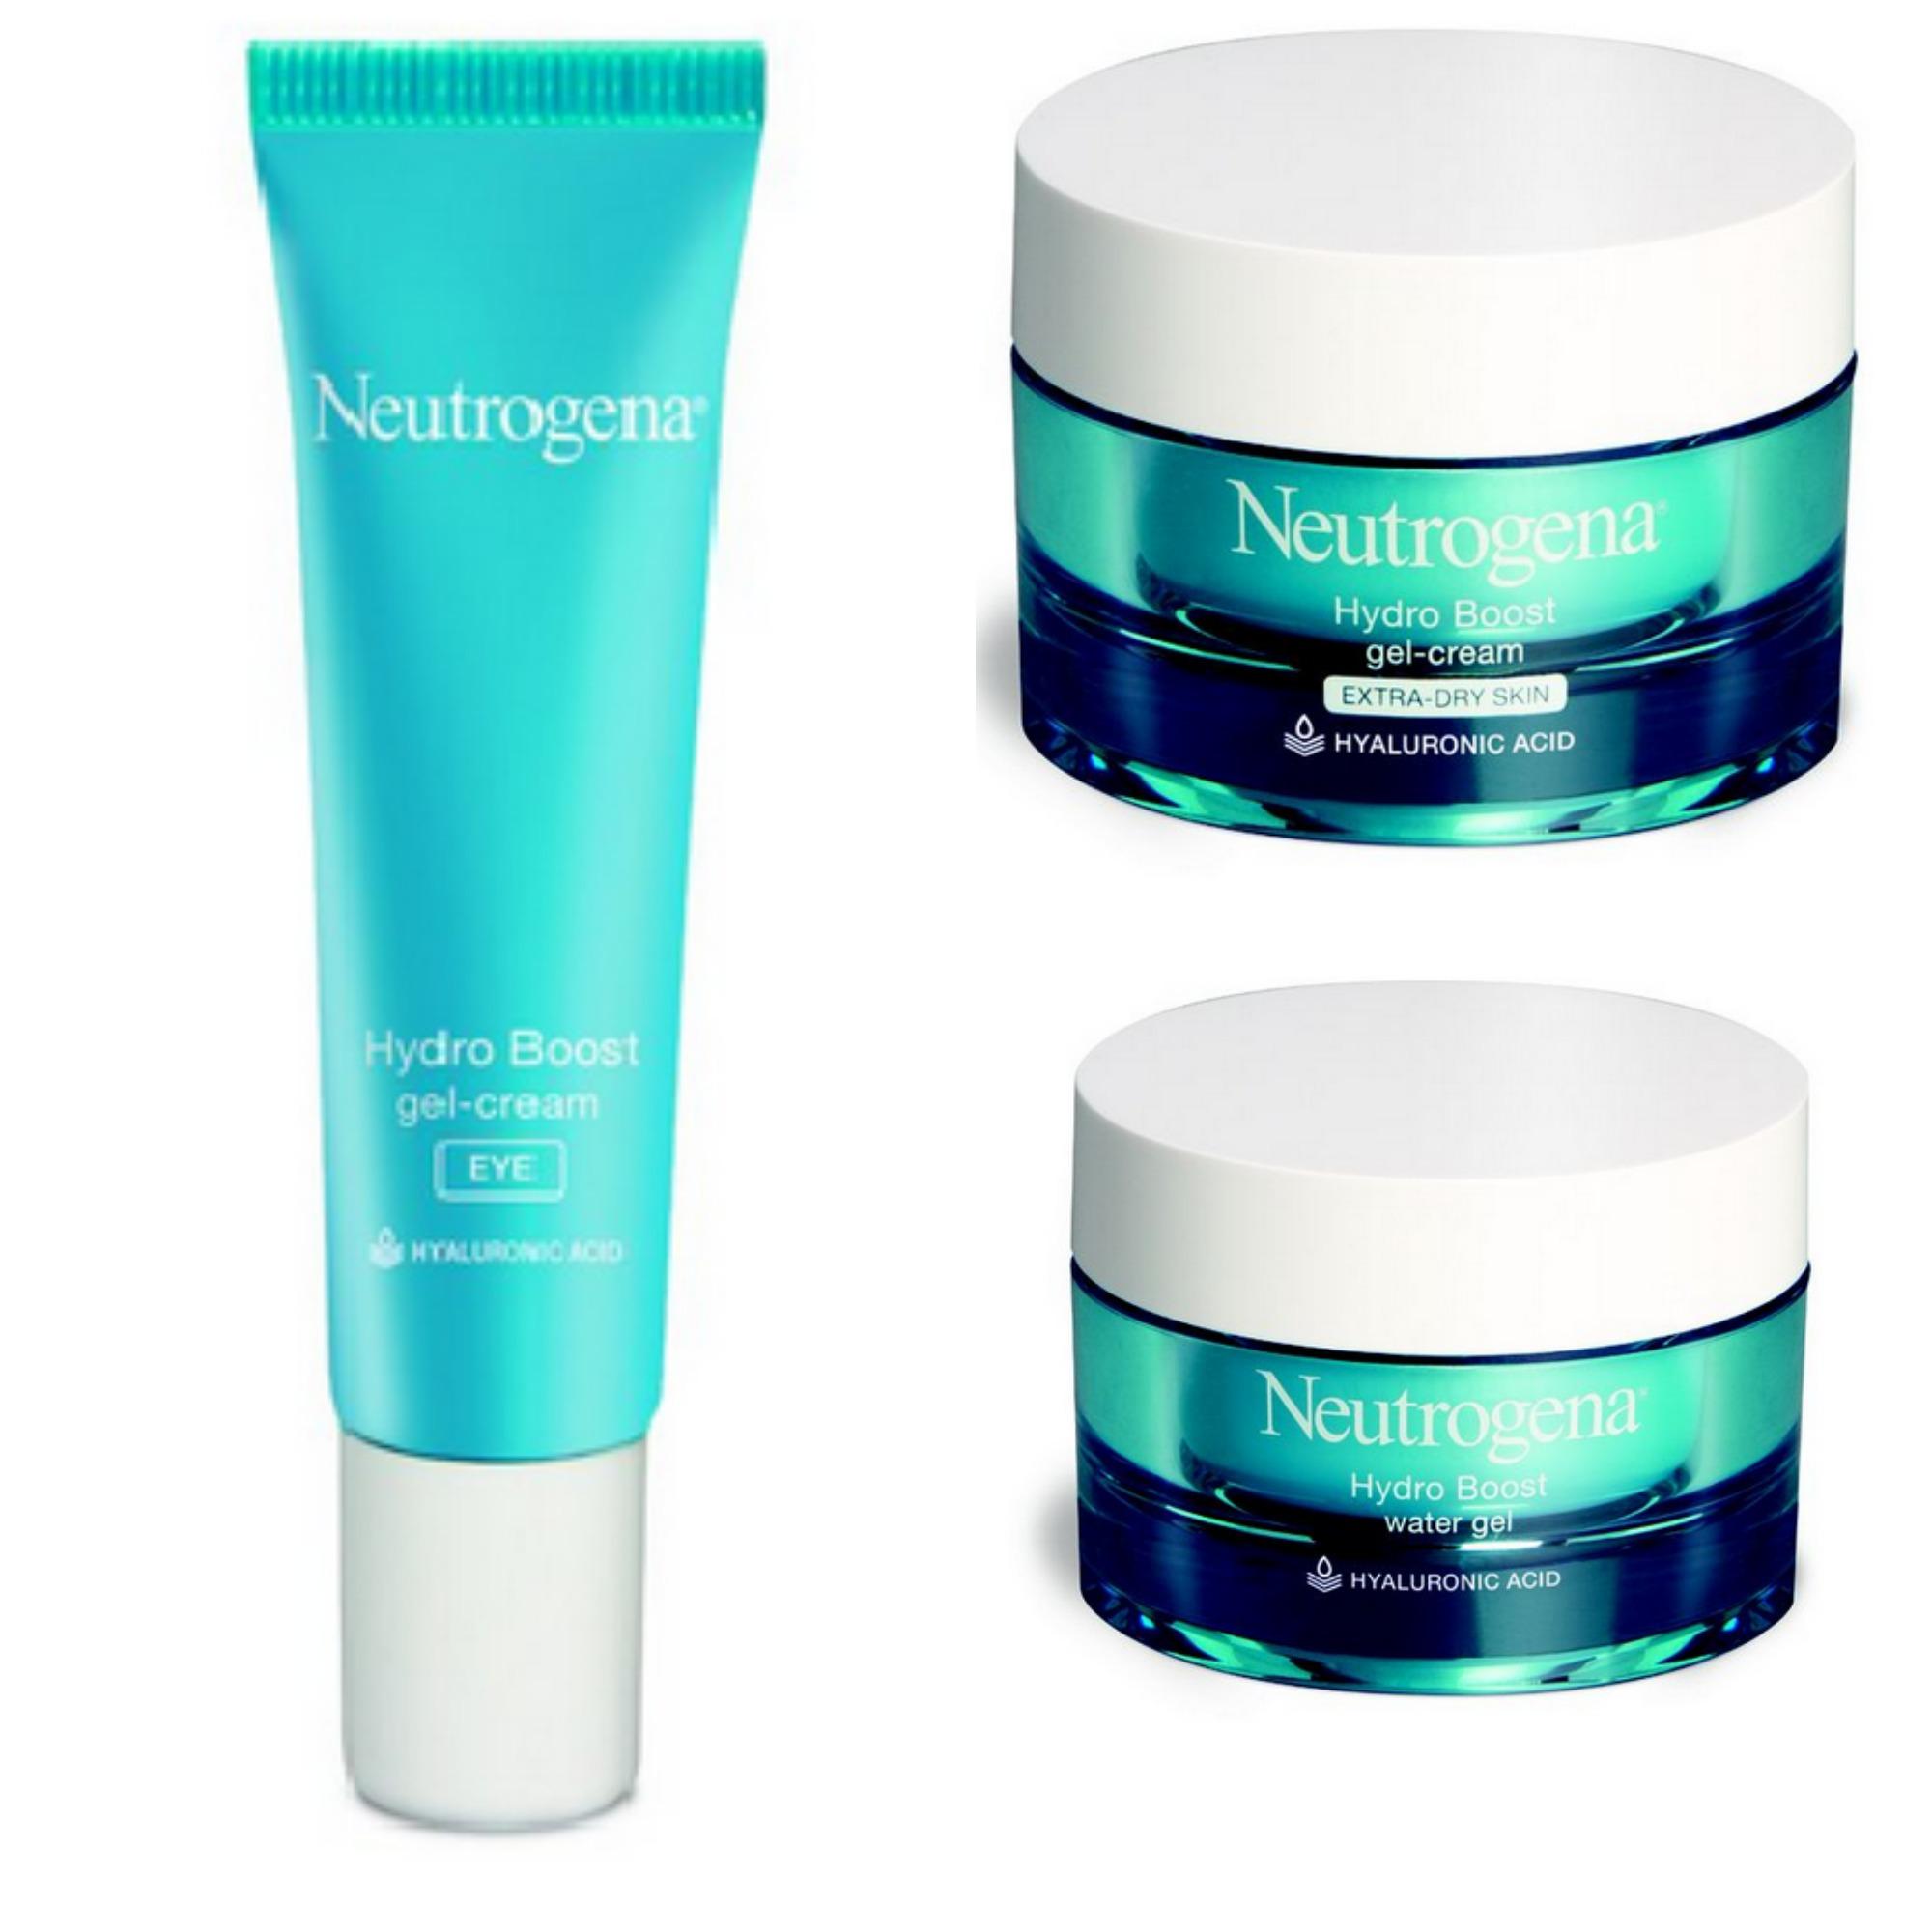 Neutrogena Corporation | Company Profile, Marketing Contacts, Media Spend, Brands